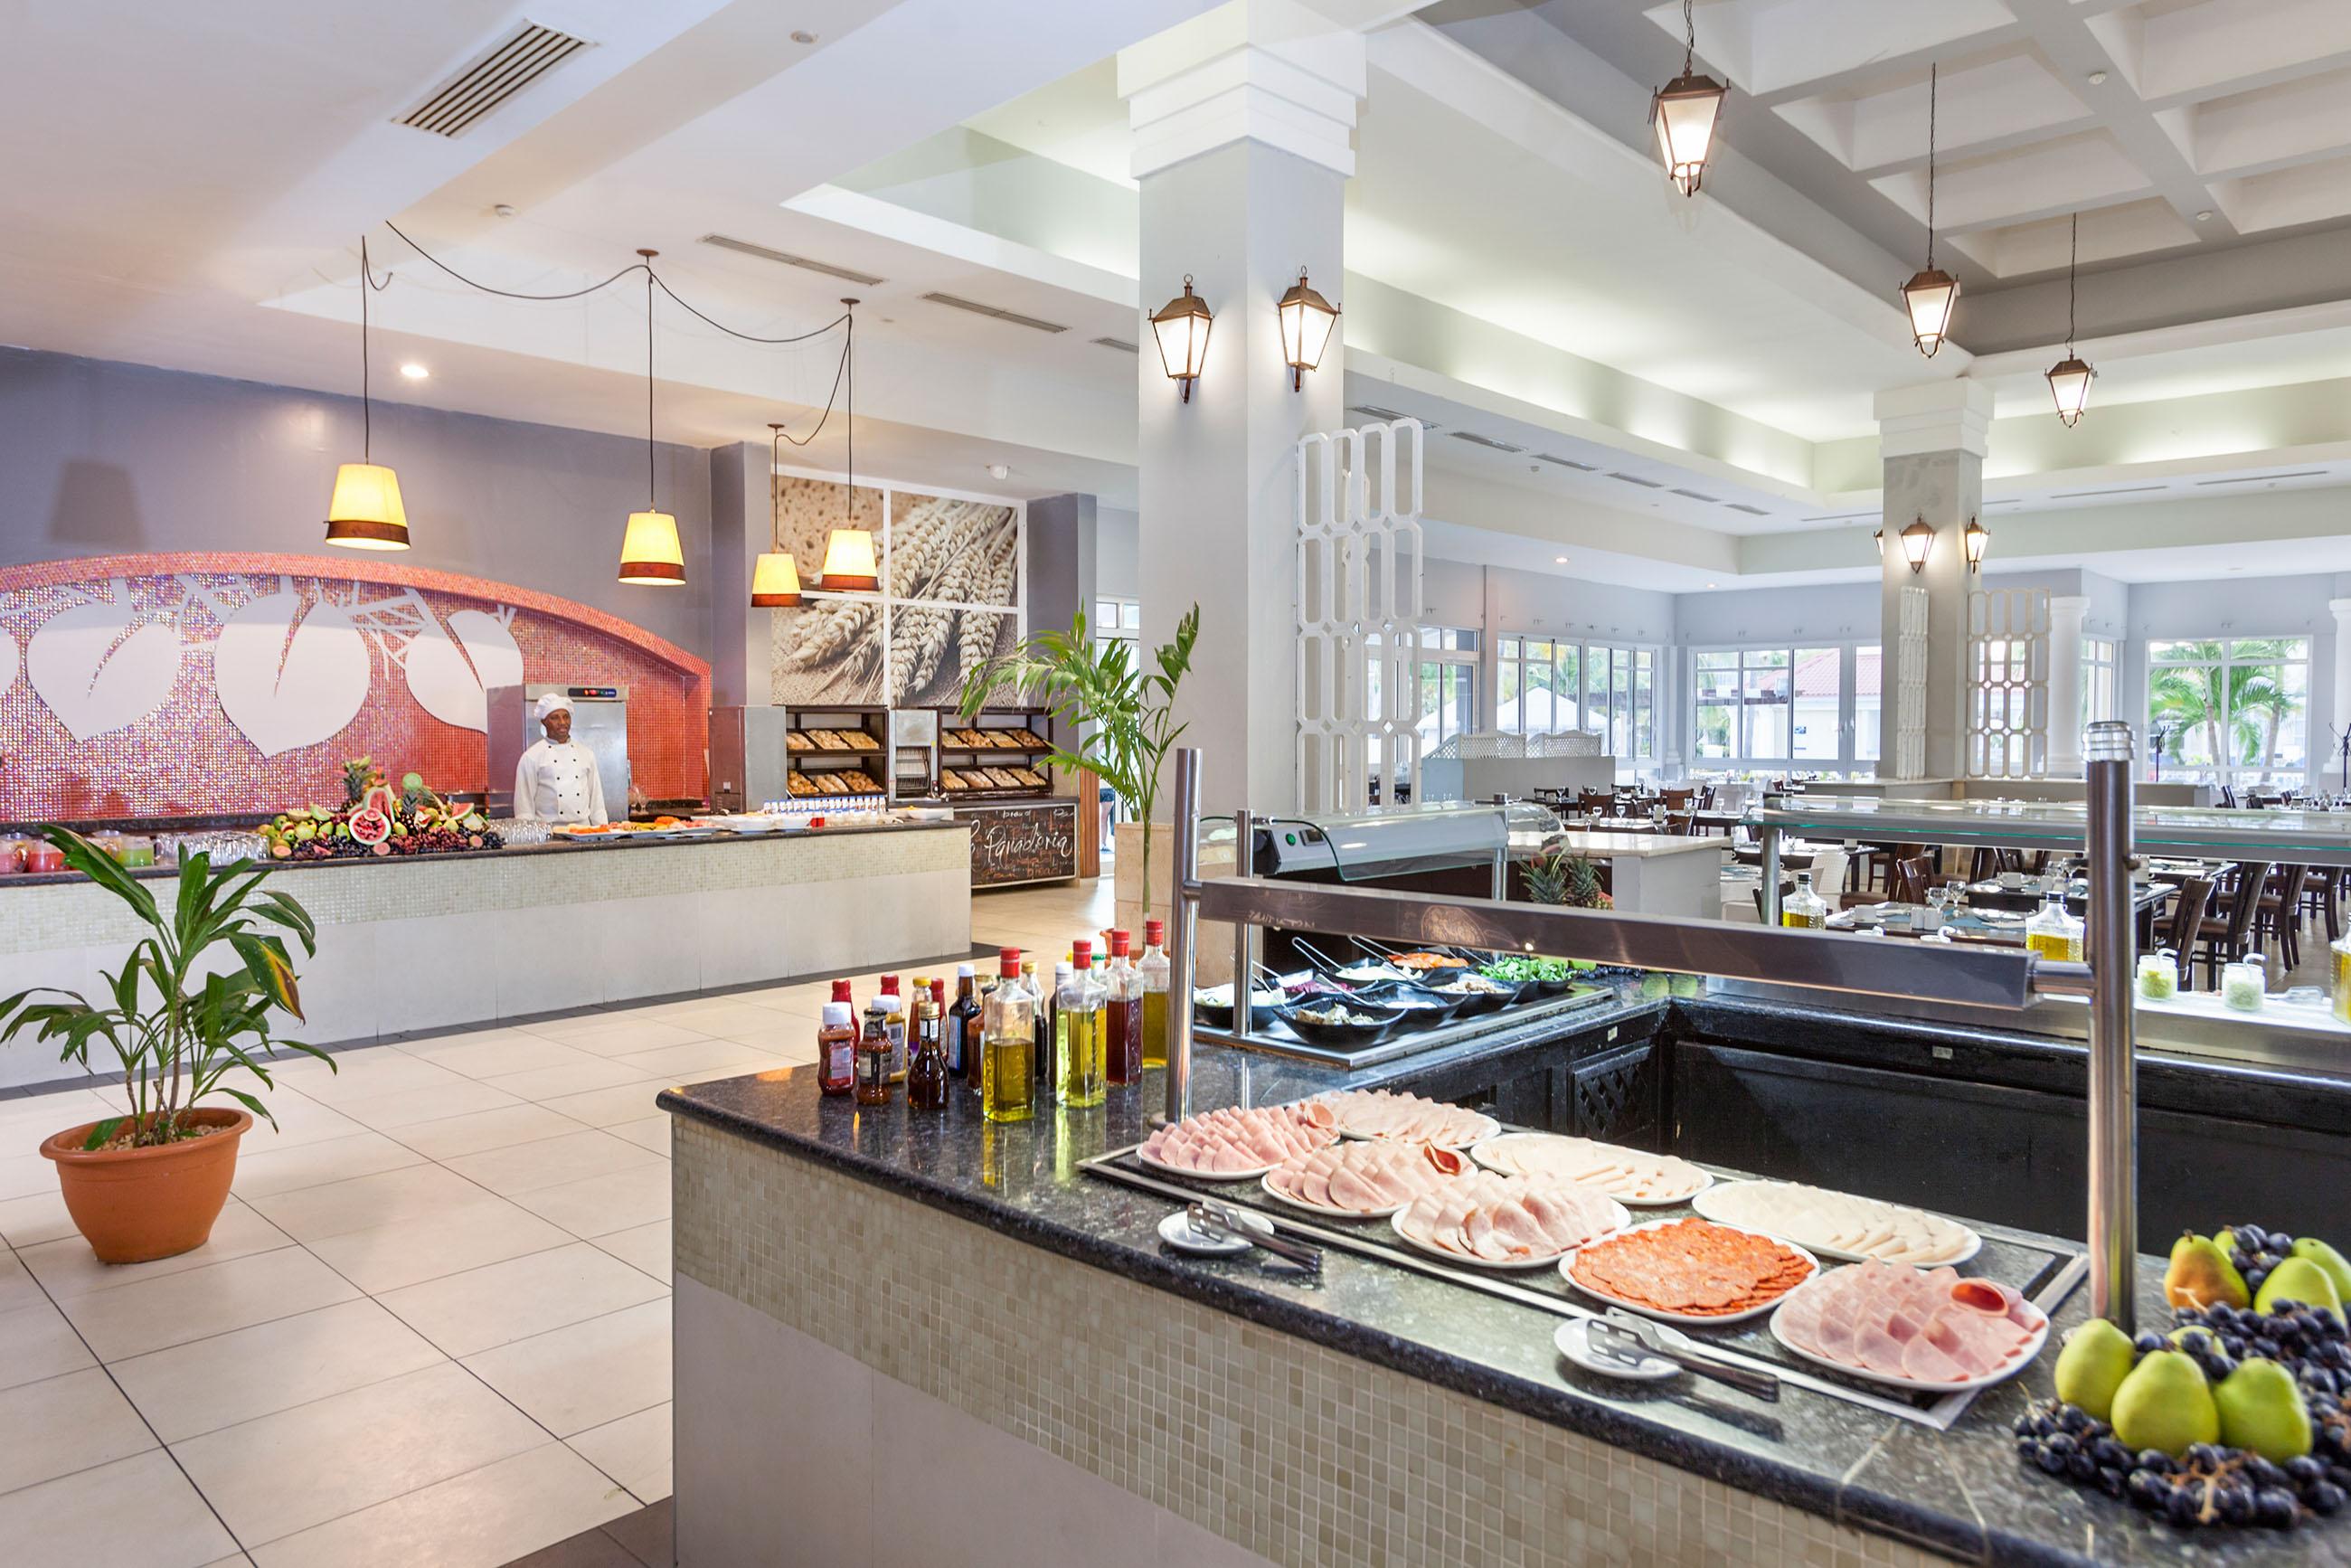 https://bubo.sk/uploads/galleries/5007/201paradisusprincesadelmar-restaurante_buffet_gran_terraza.jpg